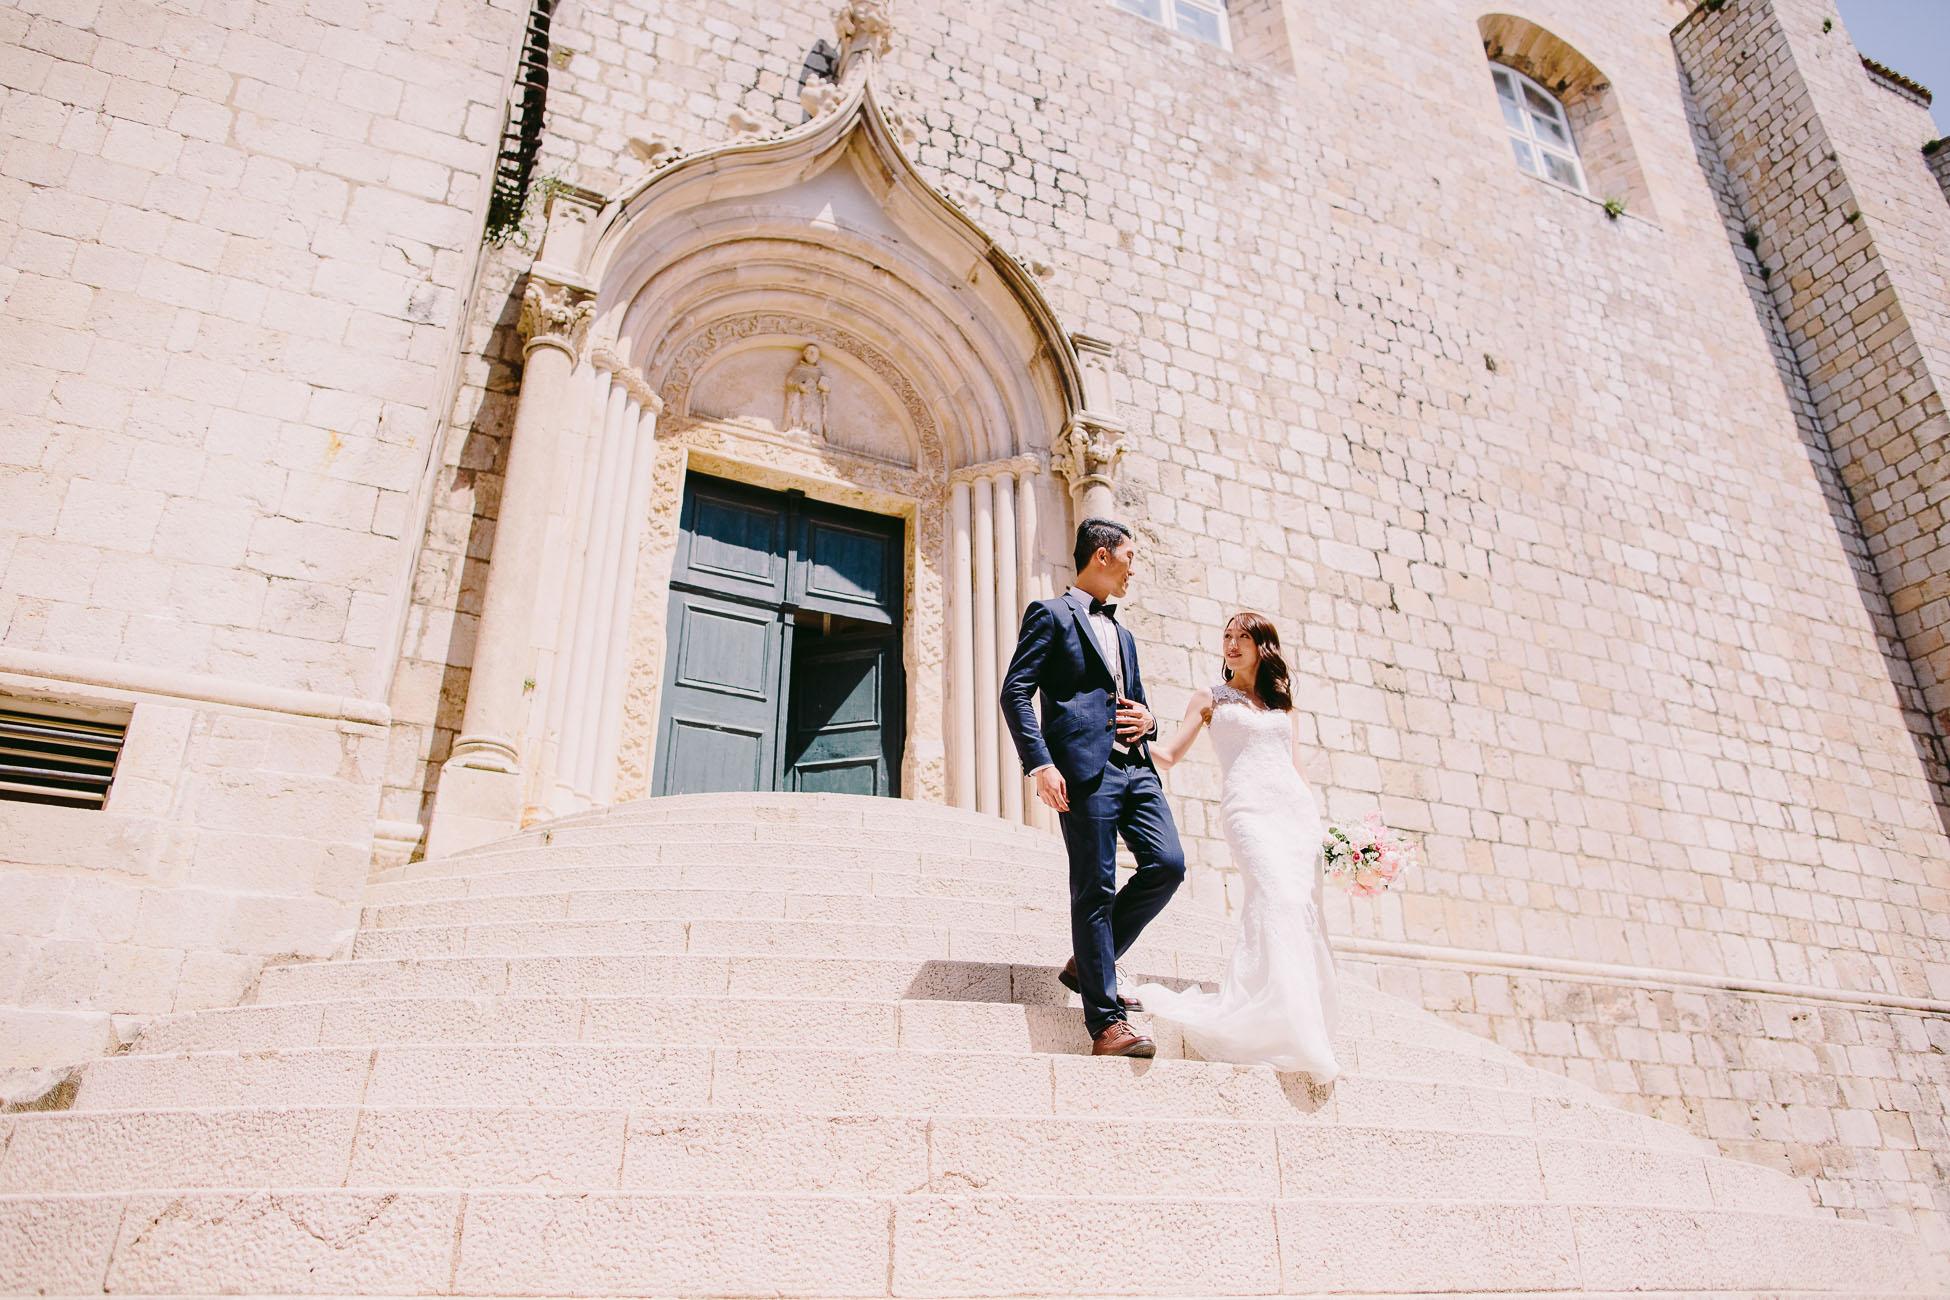 Prewedding photoshoot in Dubrovnik Croatia